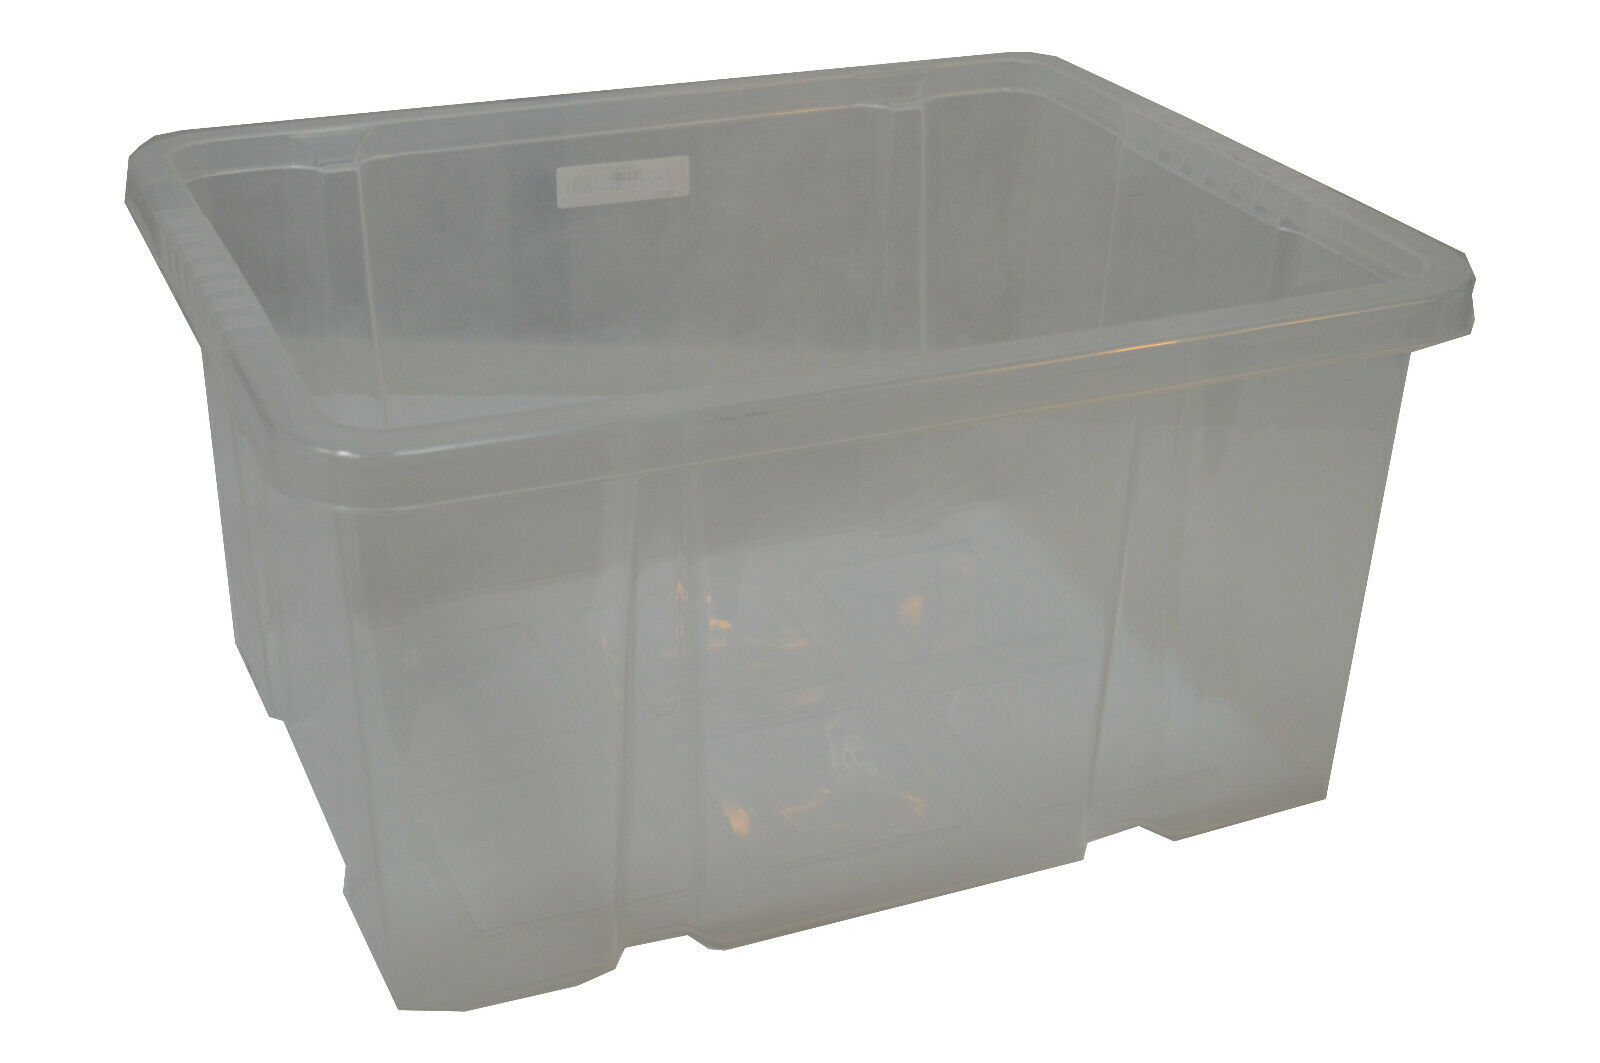 12X Dreh Stapelbox Aufbewahrungsbox Eurobox 44x35x23,5cm 29L transparent Unibox | Sonderangebot